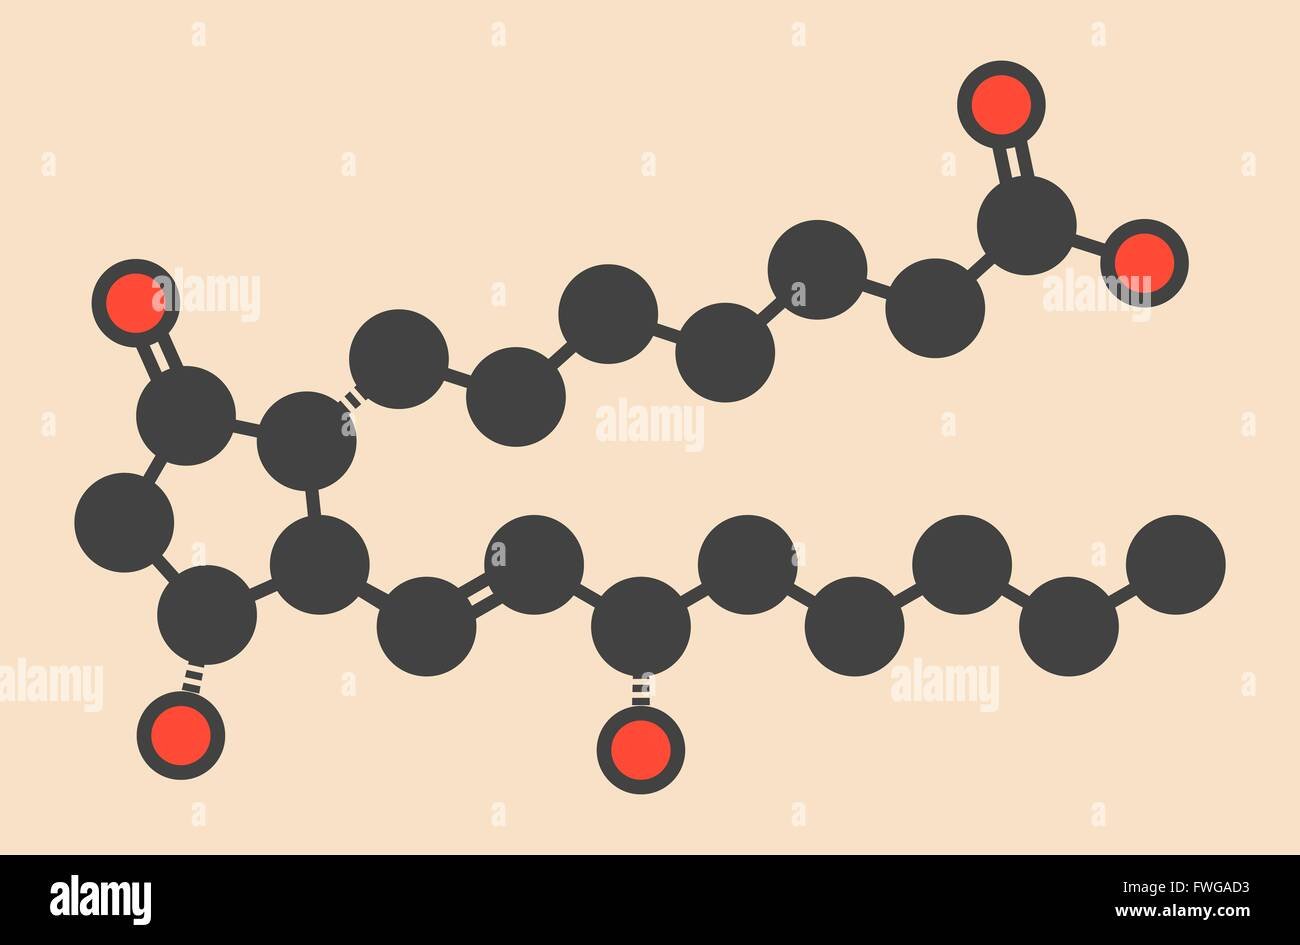 Alprostadil (prostaglandin E1) erectile dysfunction drug molecule Stylized skeletal formula (chemical structure) - Stock Image